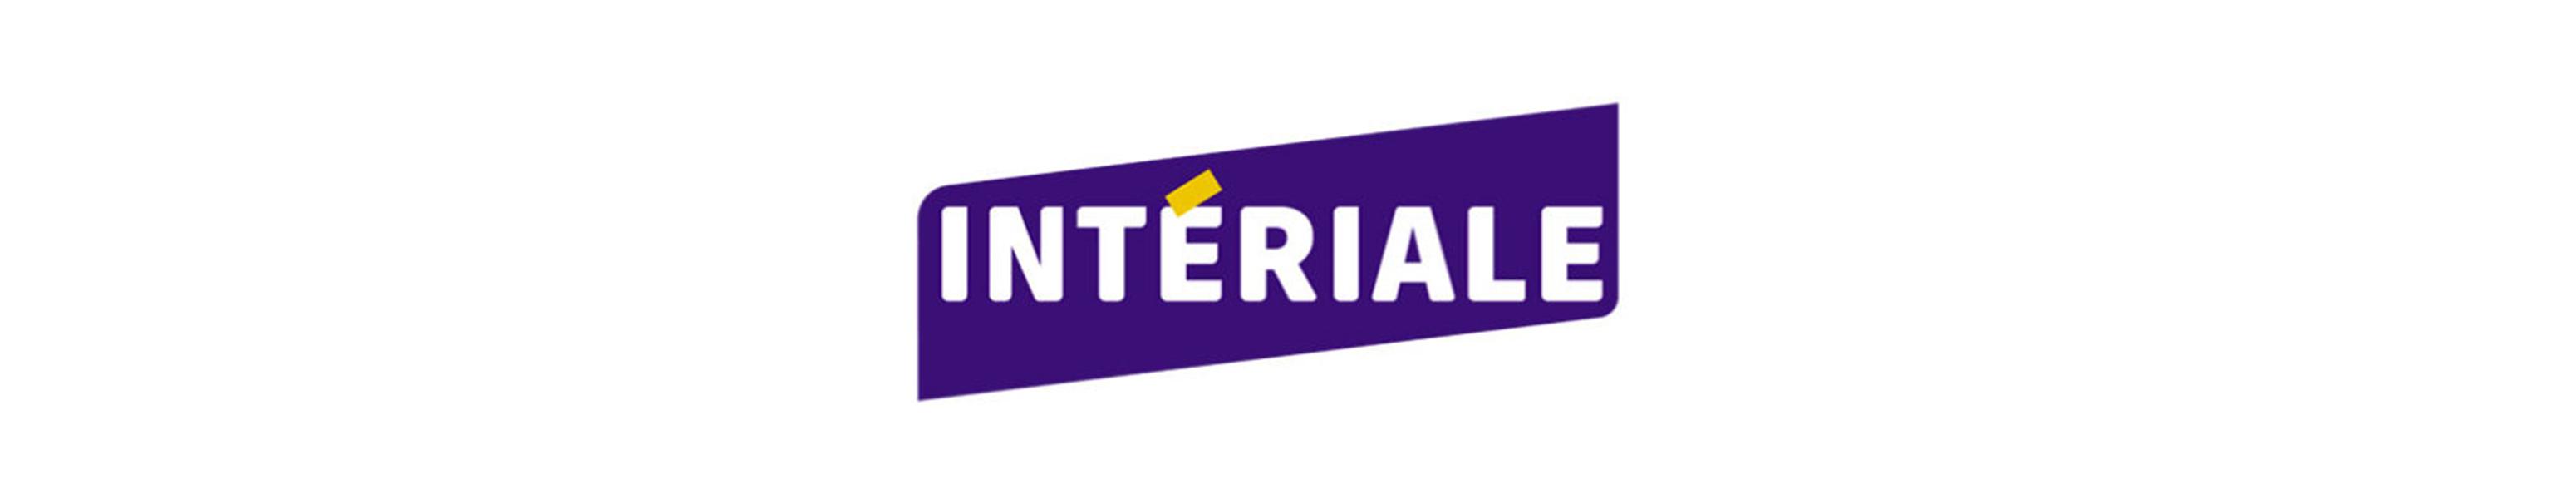 logo interiale